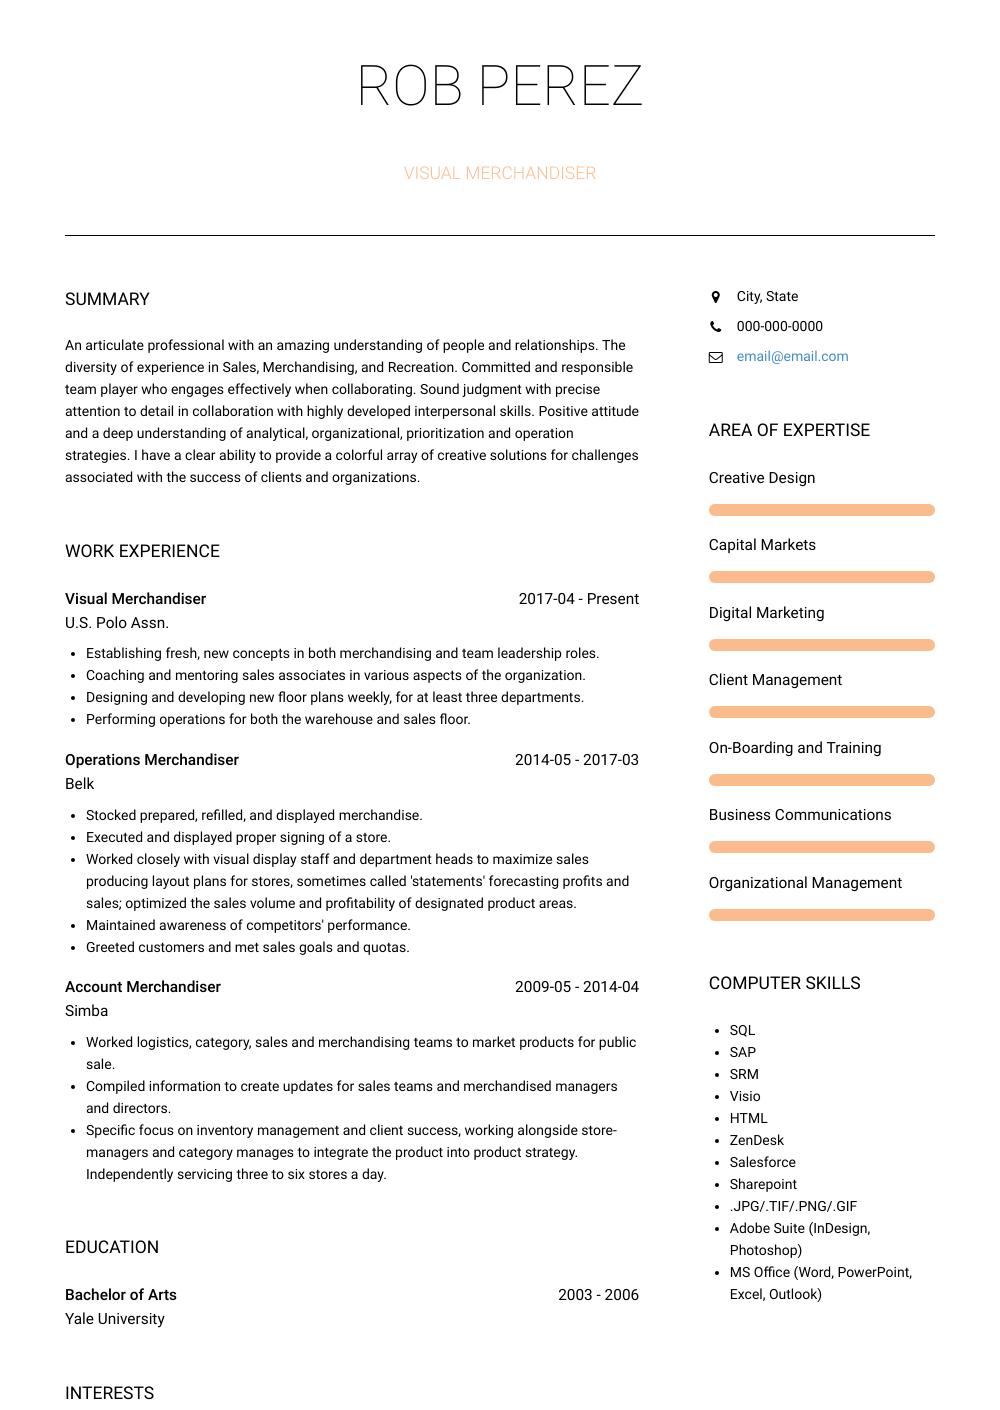 Visual Merchandiser Resume Sample and Template